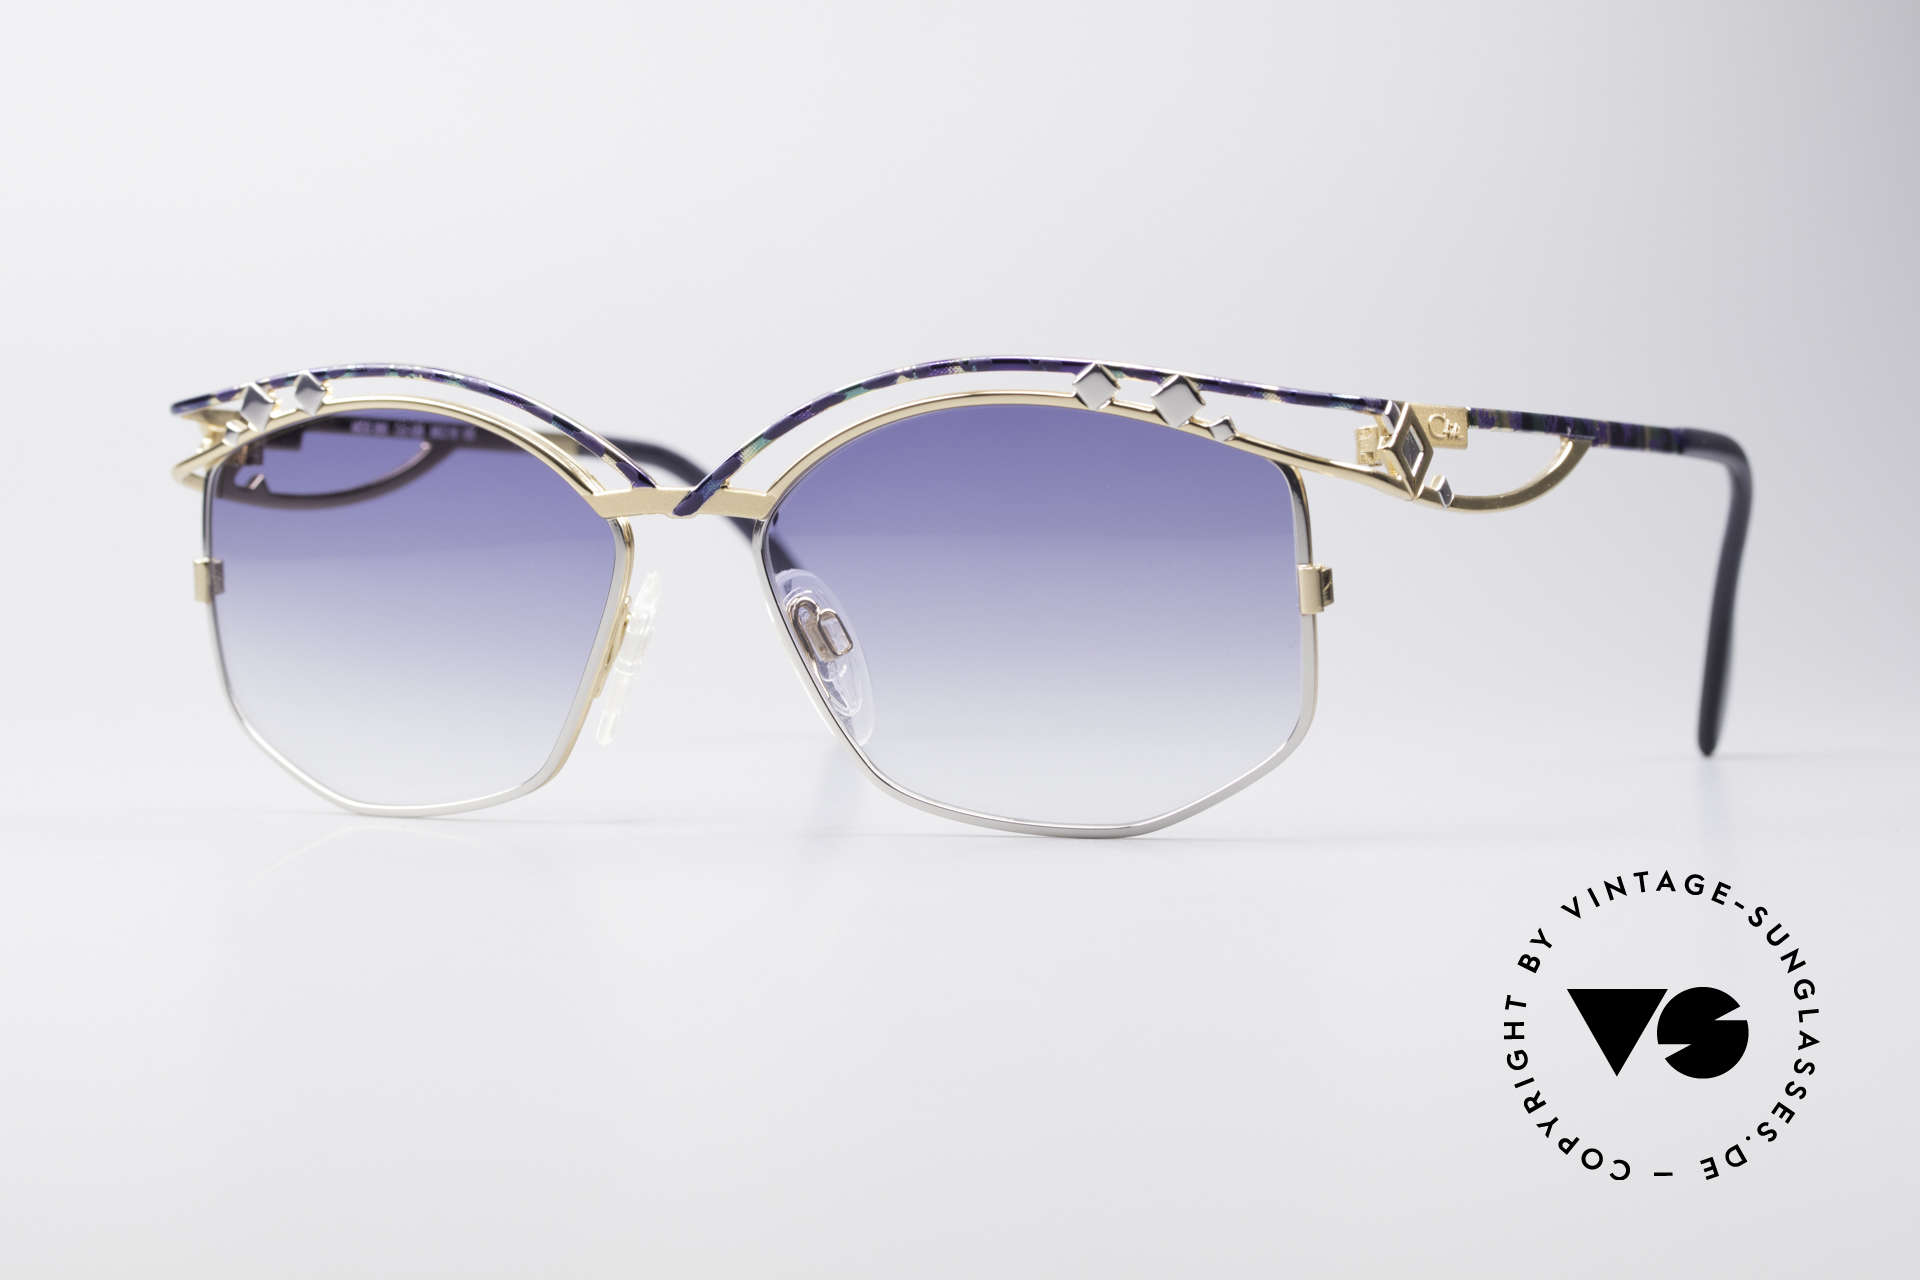 Cazal 280 True Vintage Ladies Sunglasses, rare VINTAGE CAZAL designer sunglasses from 1997, Made for Women